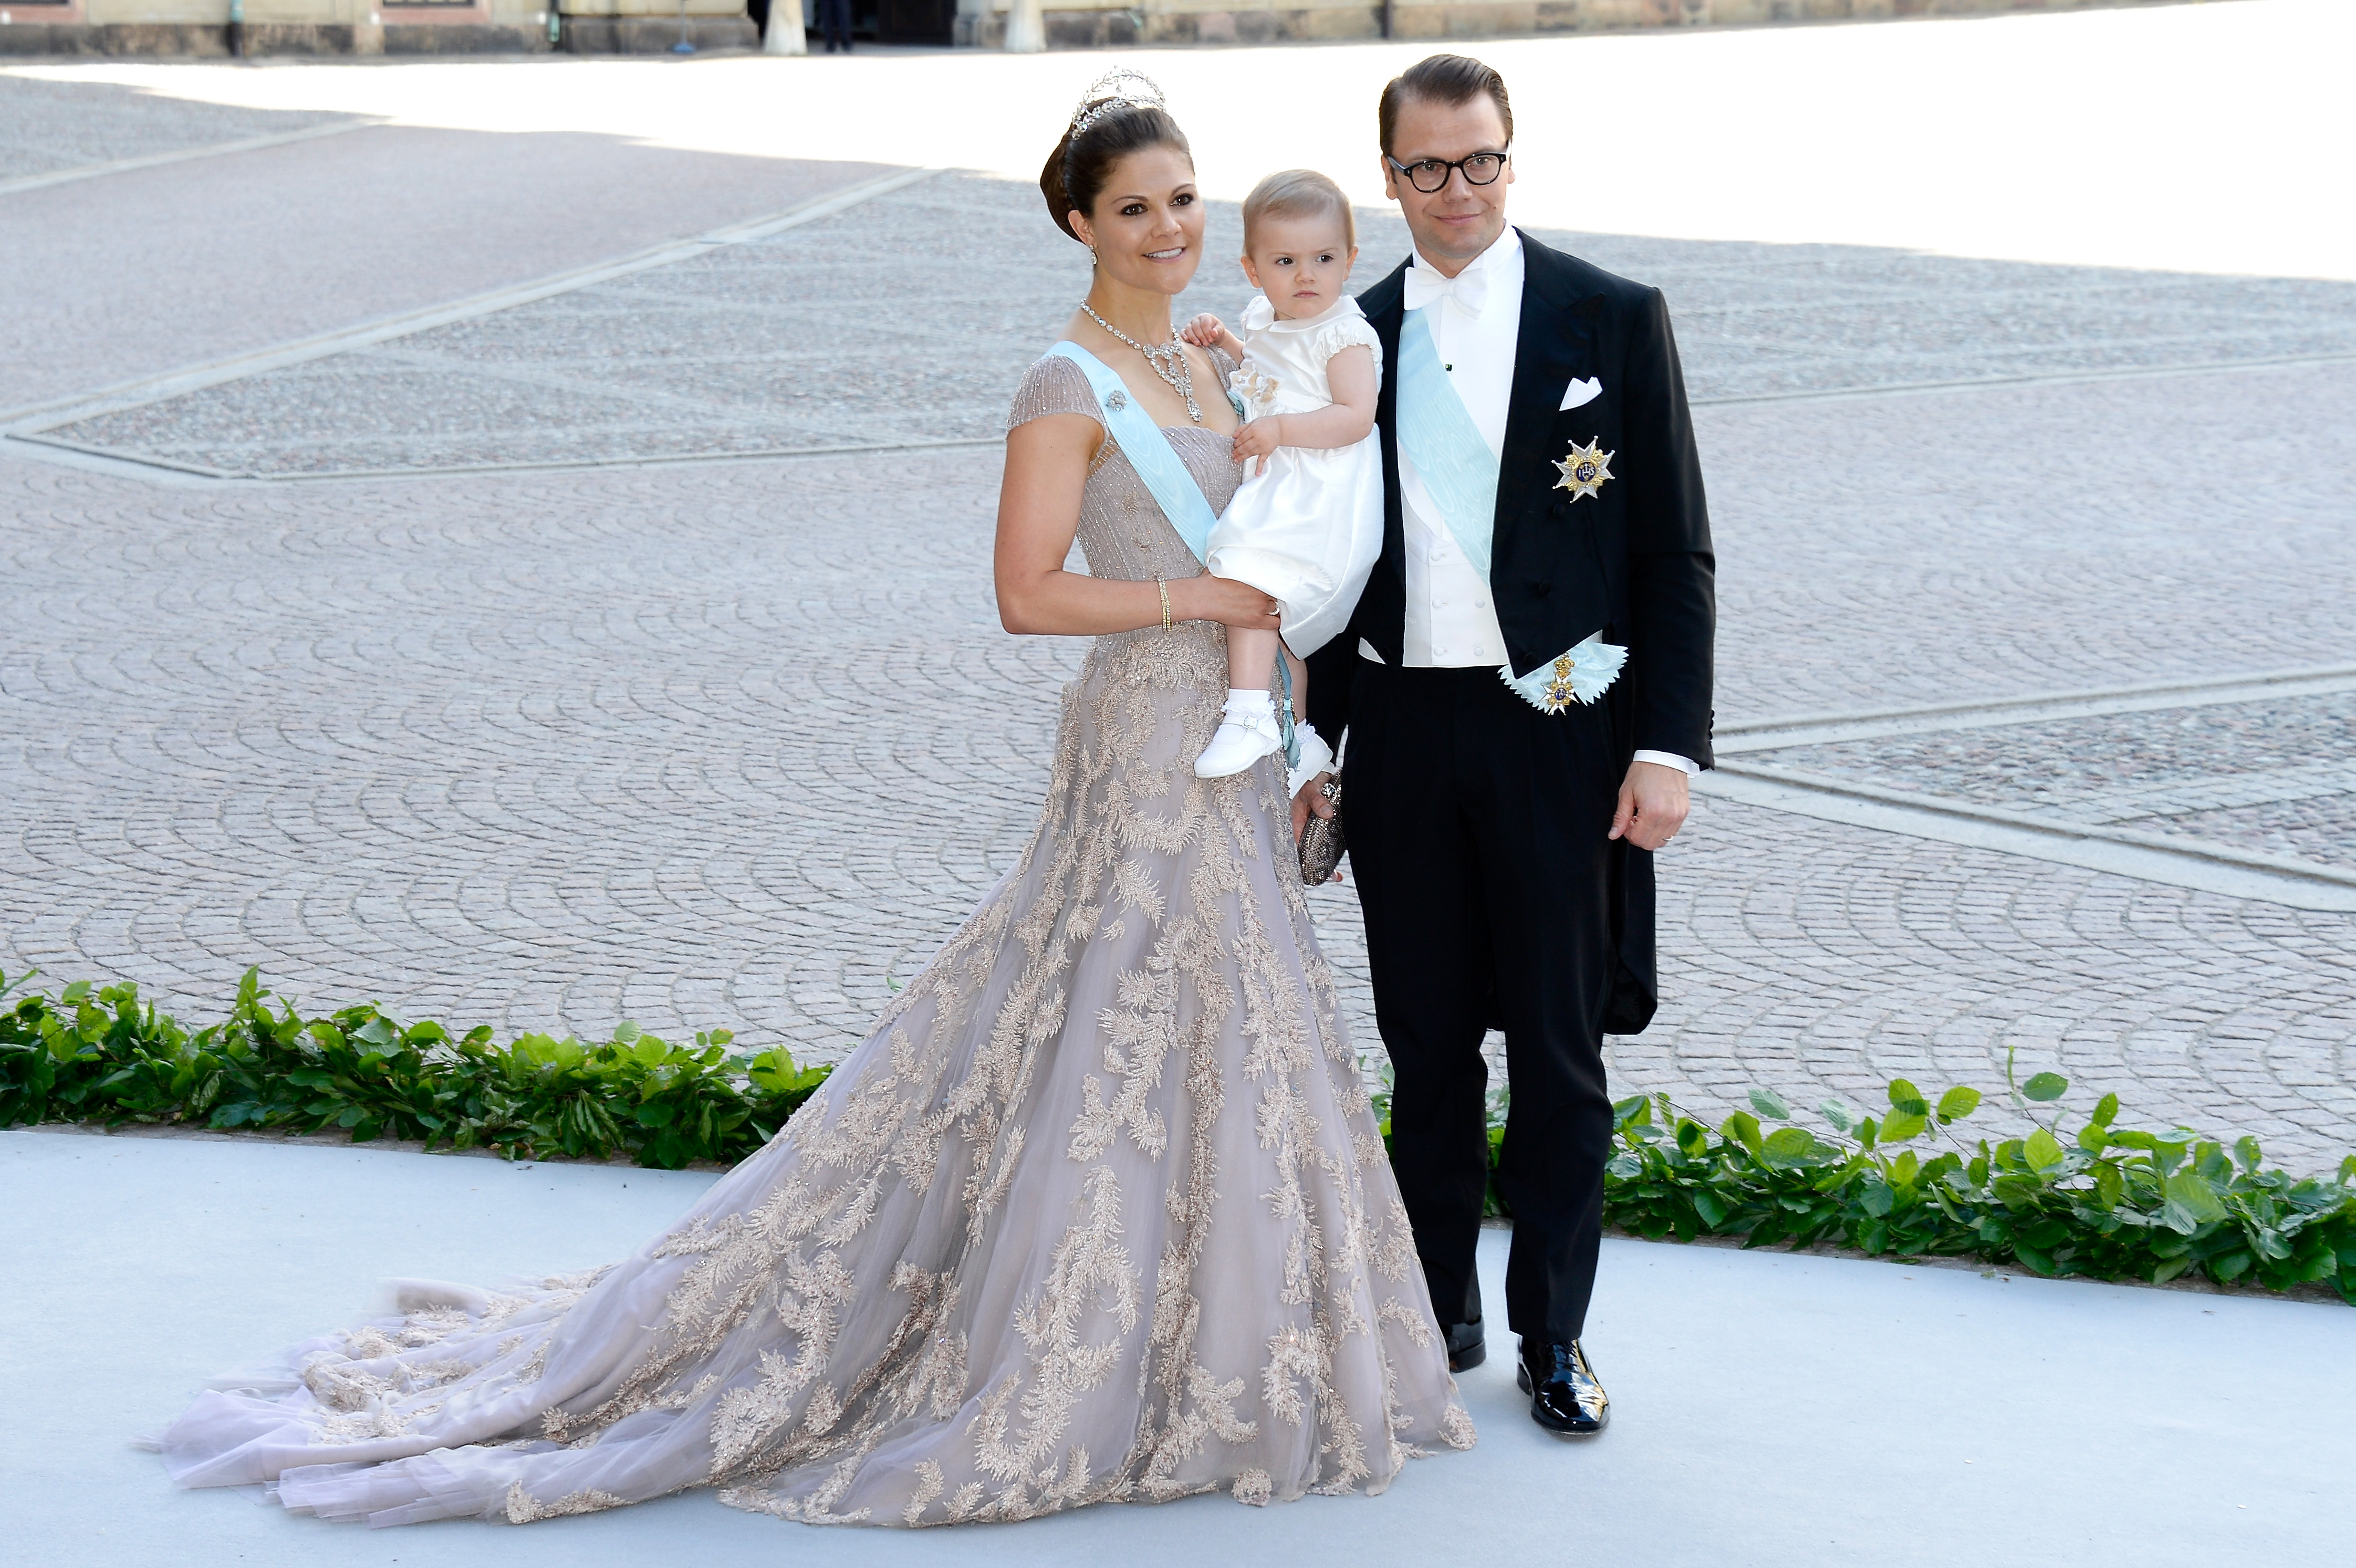 Royal Wedding: Princess Madeleine says \'I do\' at lavish bash ...